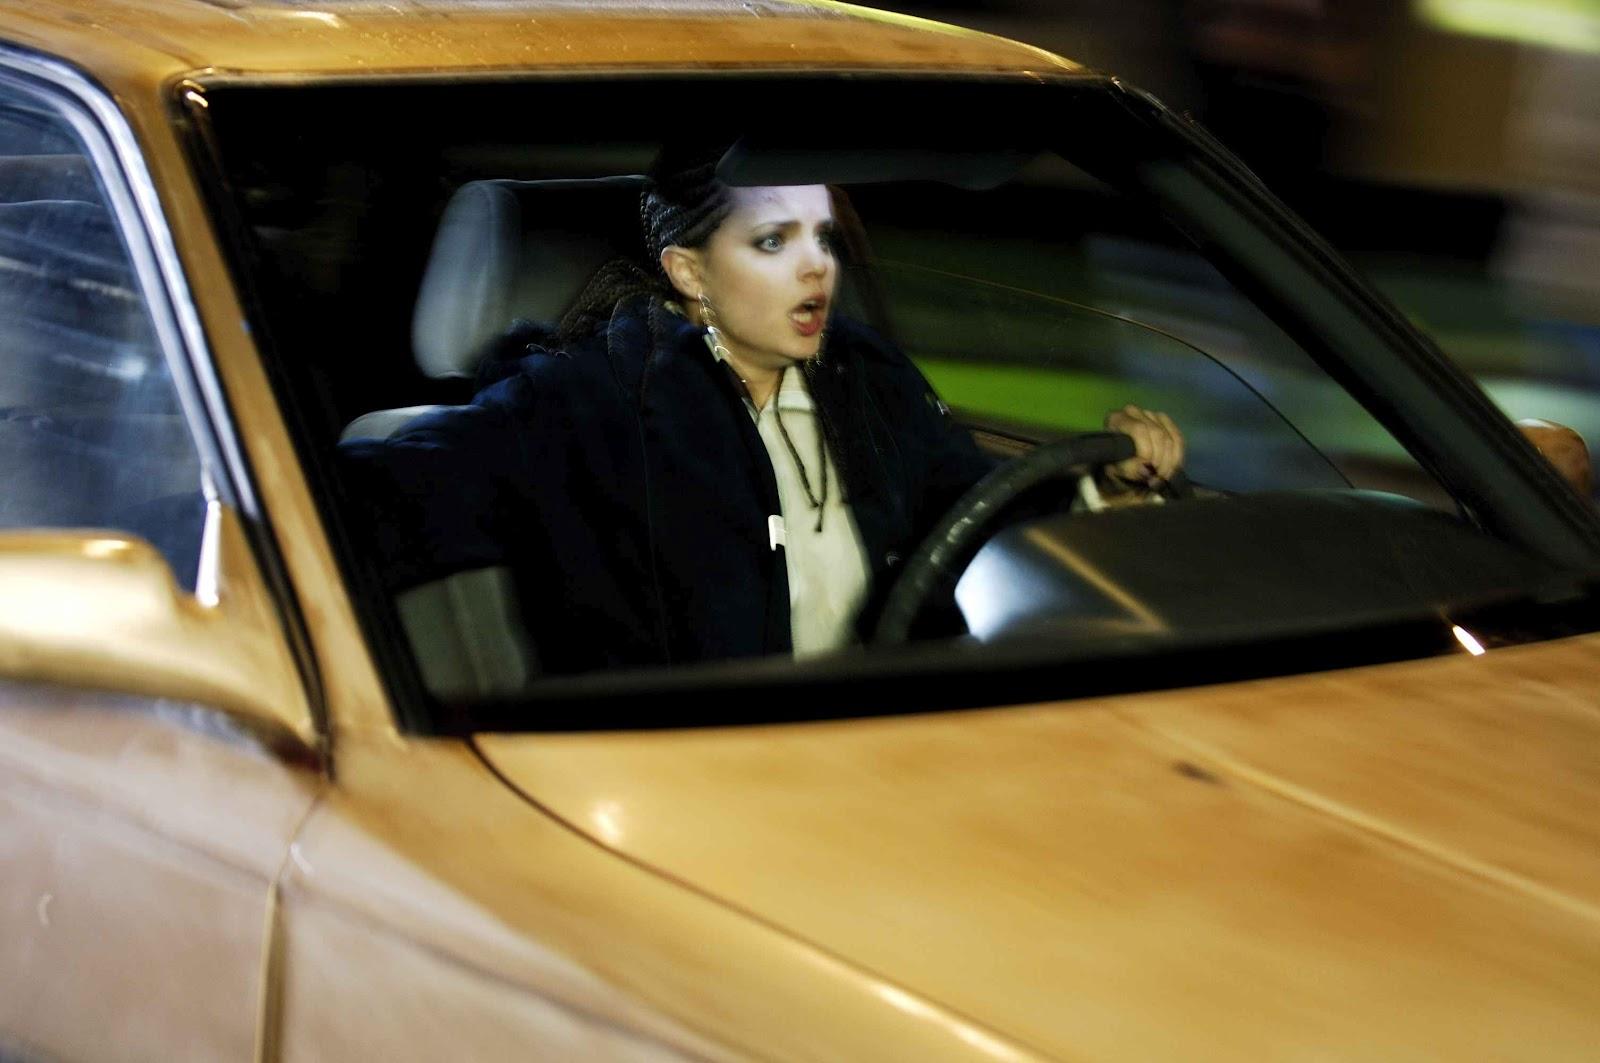 http://1.bp.blogspot.com/-CUeEVsaDGSU/UBBQ8Xap3cI/AAAAAAAAEJs/GZkl_2RmMYA/s1600/Stuck+2007+Mena+Suvari+Stephen+Rea+poster+naked+sex+car+accident.jpg